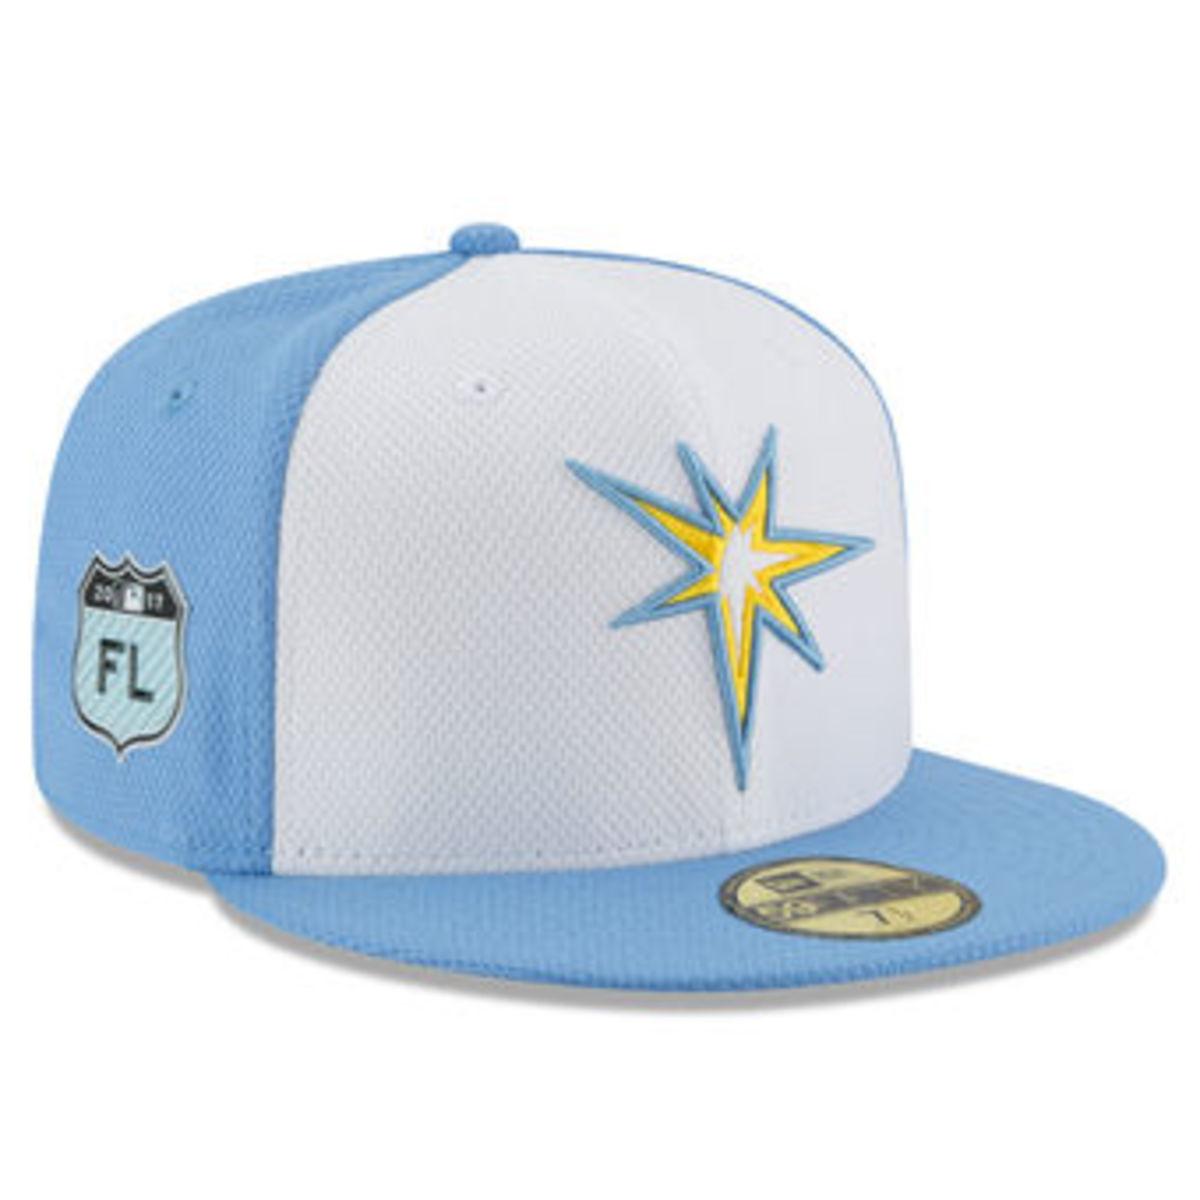 rays-spring-training-hat.jpg